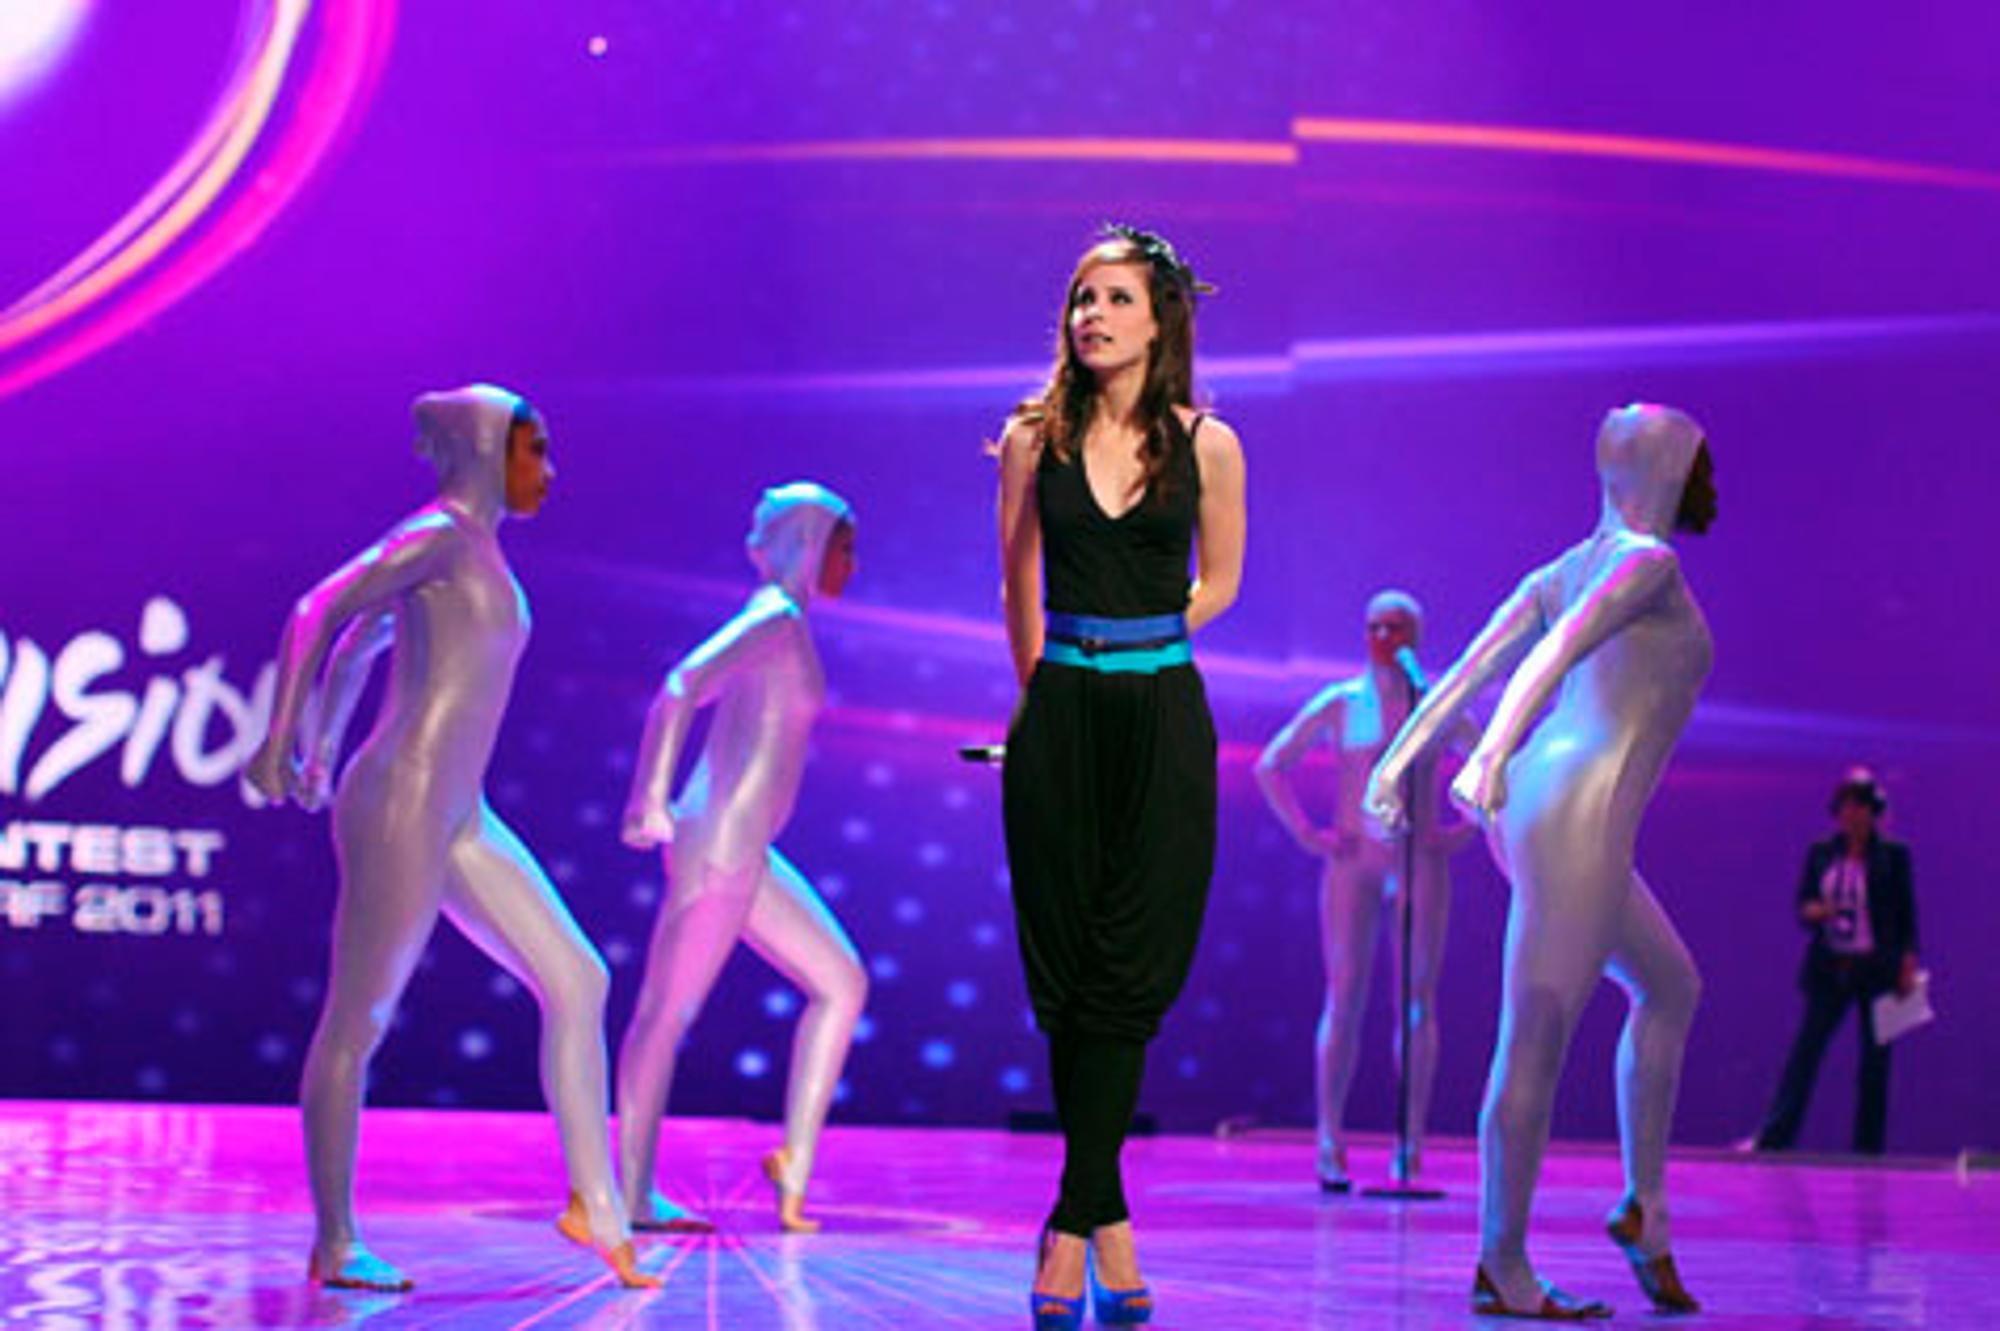 Eurovision Song Contest Aua Kameramann Verletzt Lena Meyer Landrut